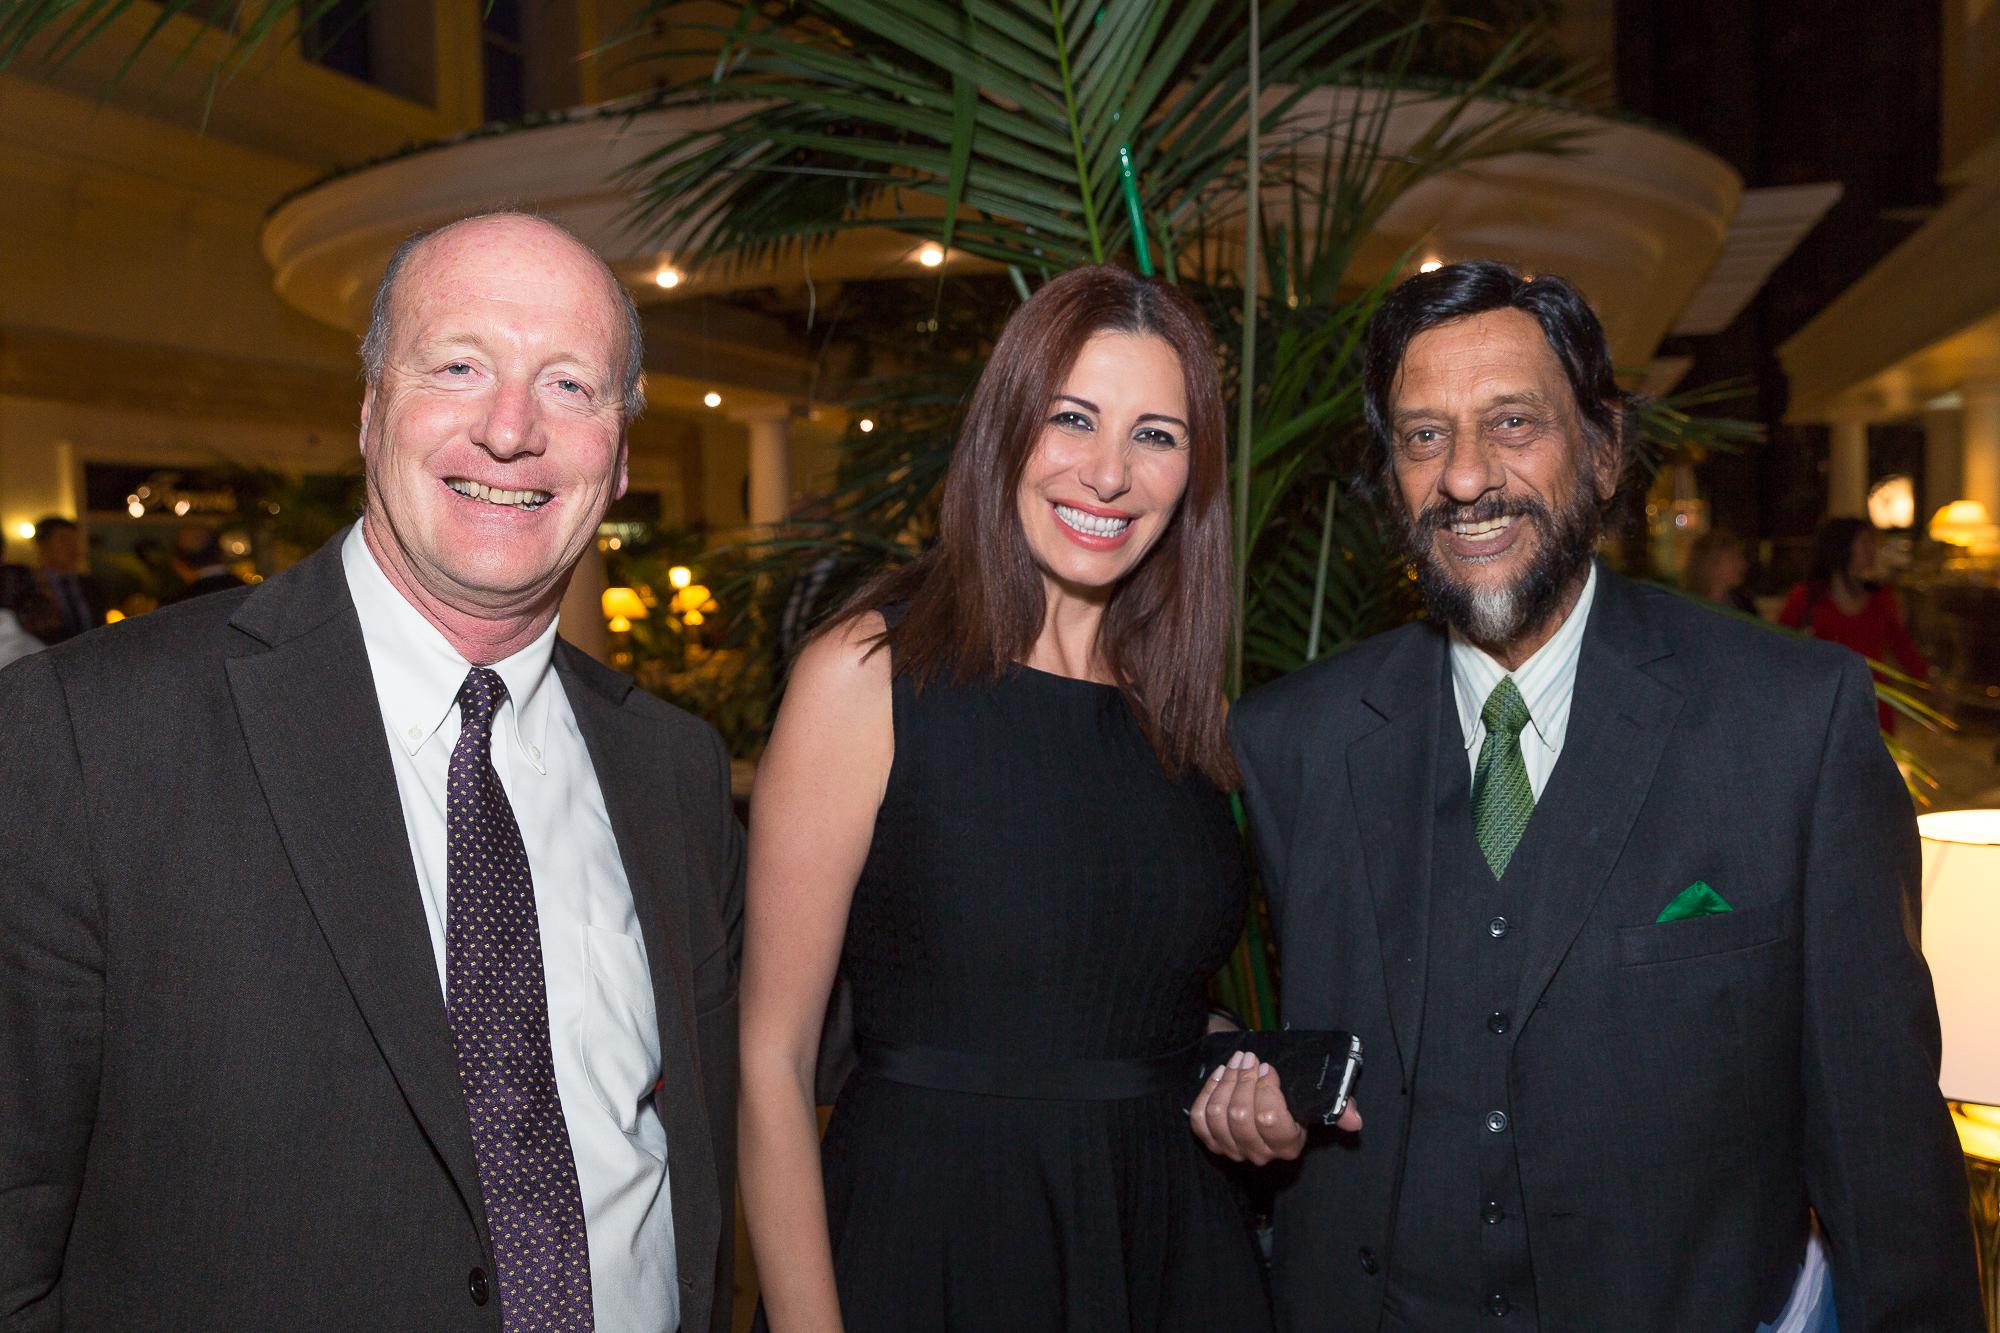 3-Randa-Kassis-with-Rajendra-Kumar-Pachauri-Nobel-Peace-Prize-and-Renaud-Girard-senior-reporter